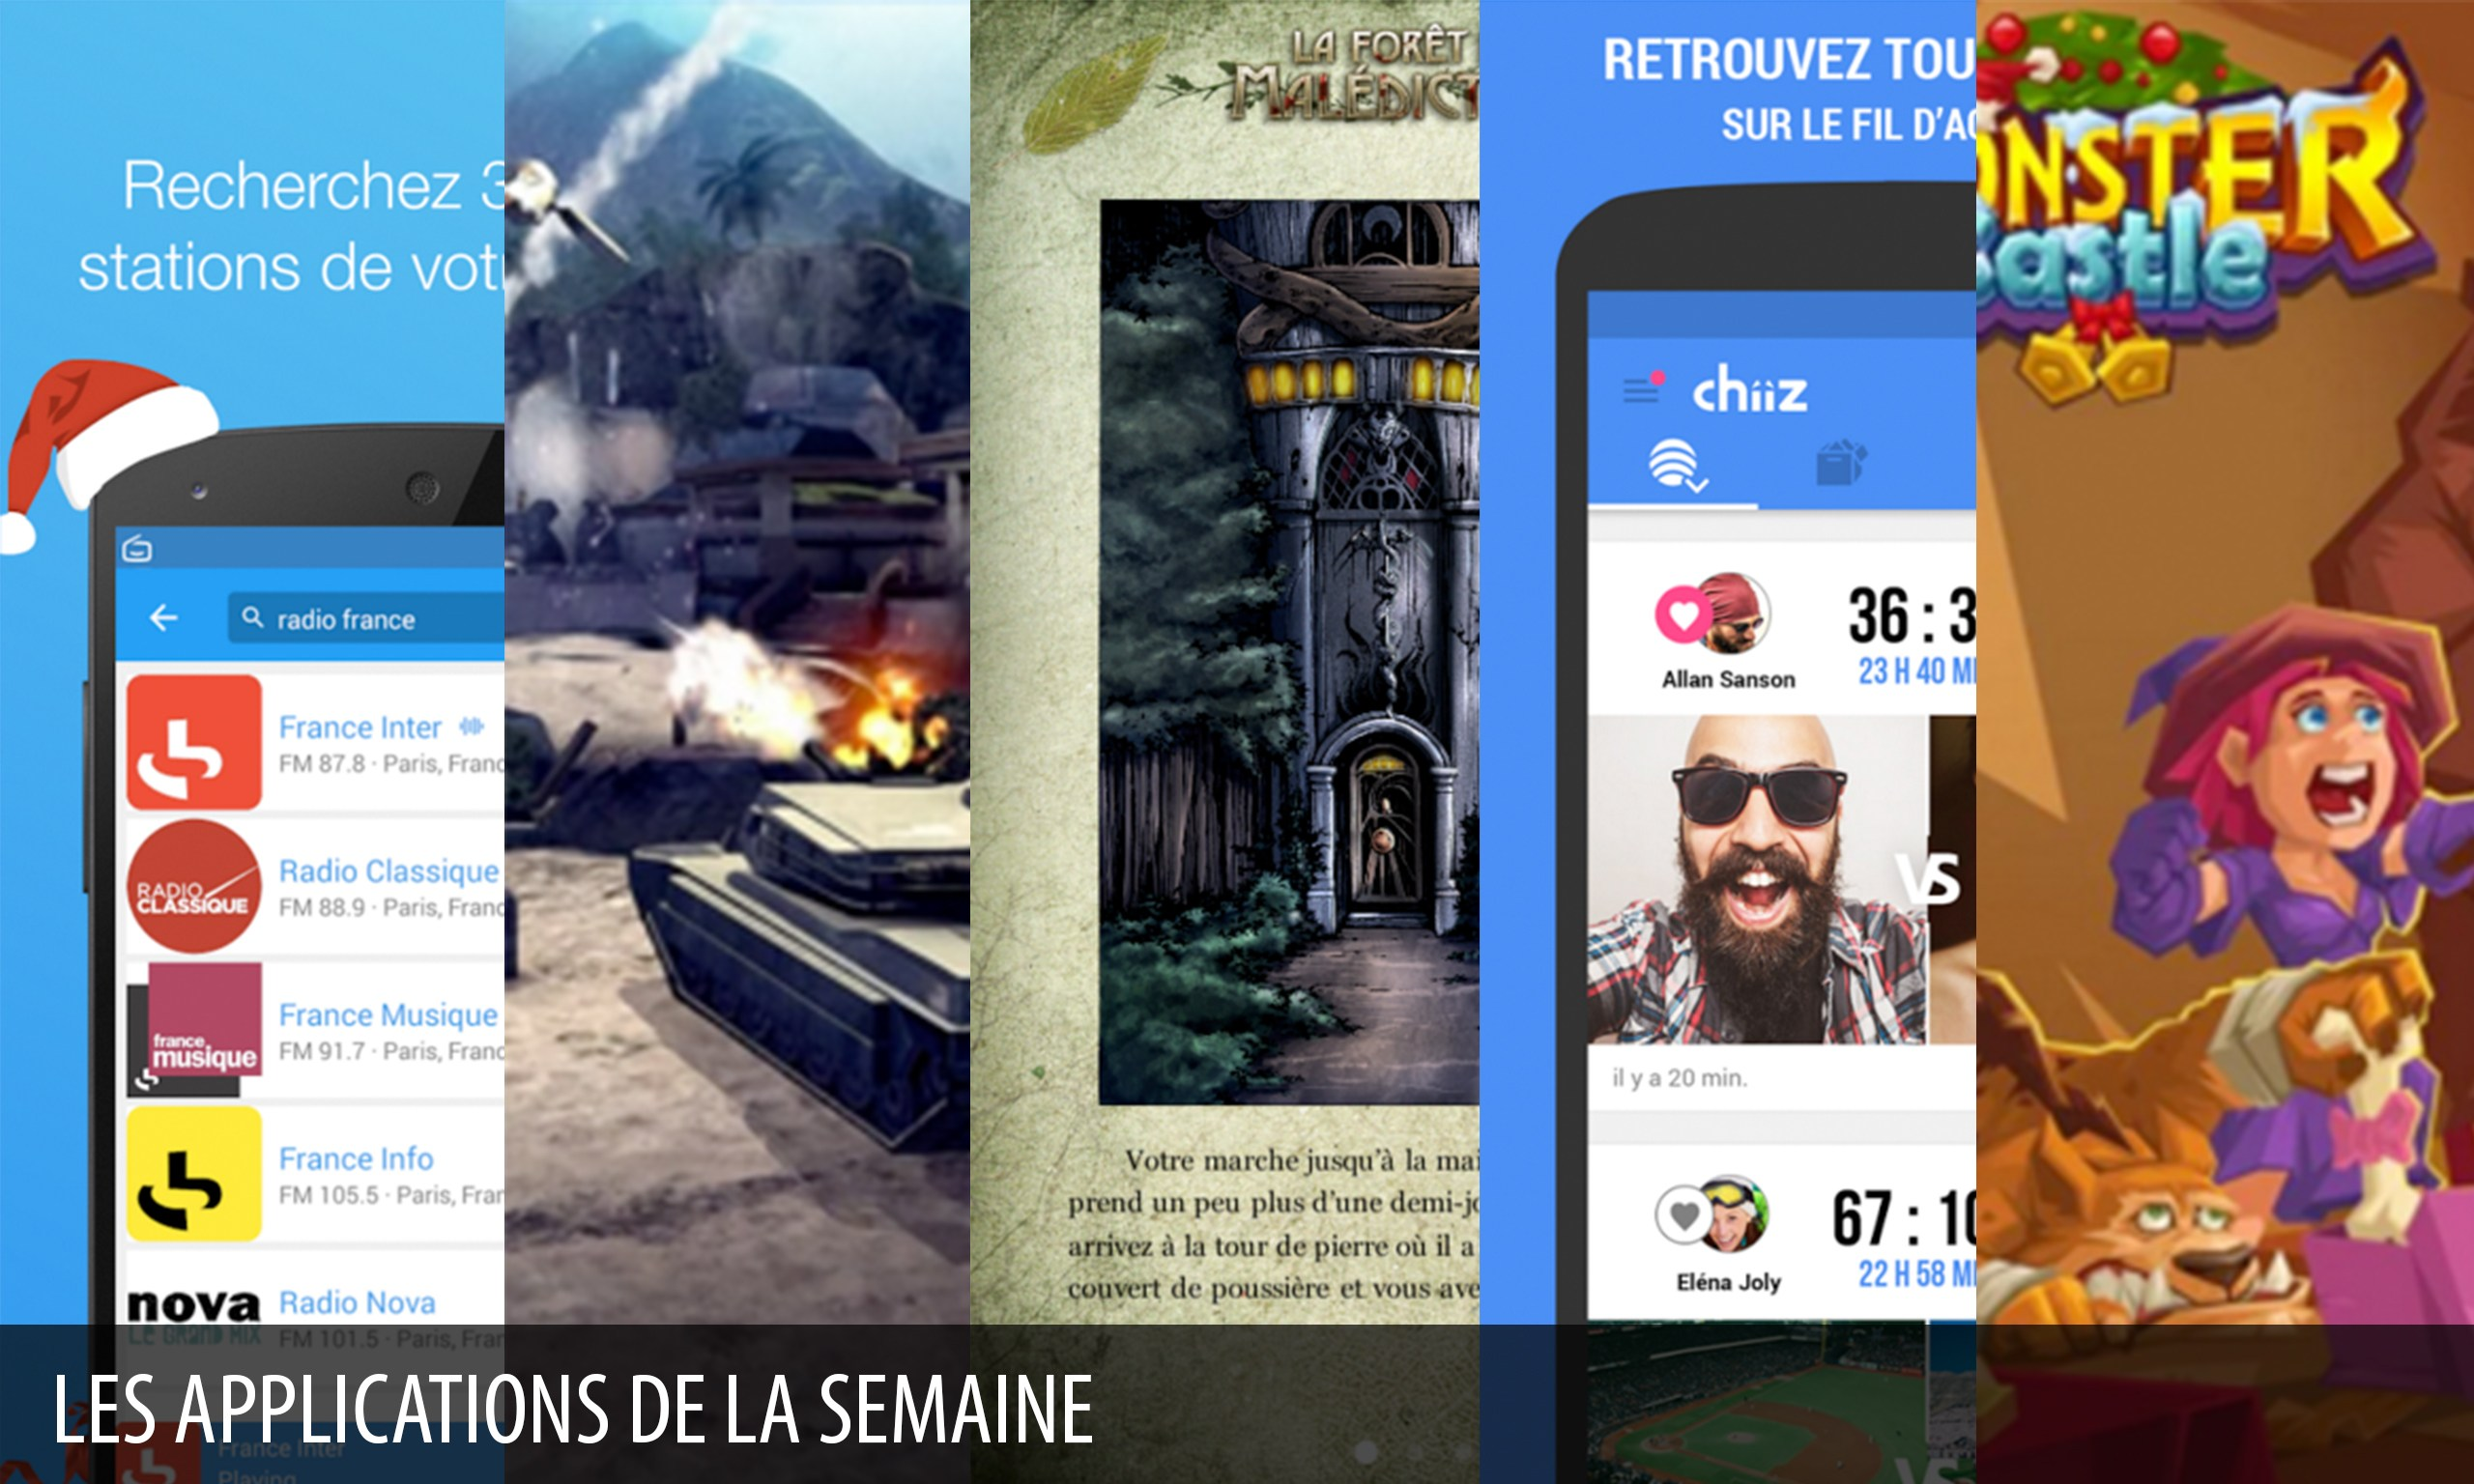 Les apps de la semaine : Modern Combat 4: Zero Hour, Chiiz…